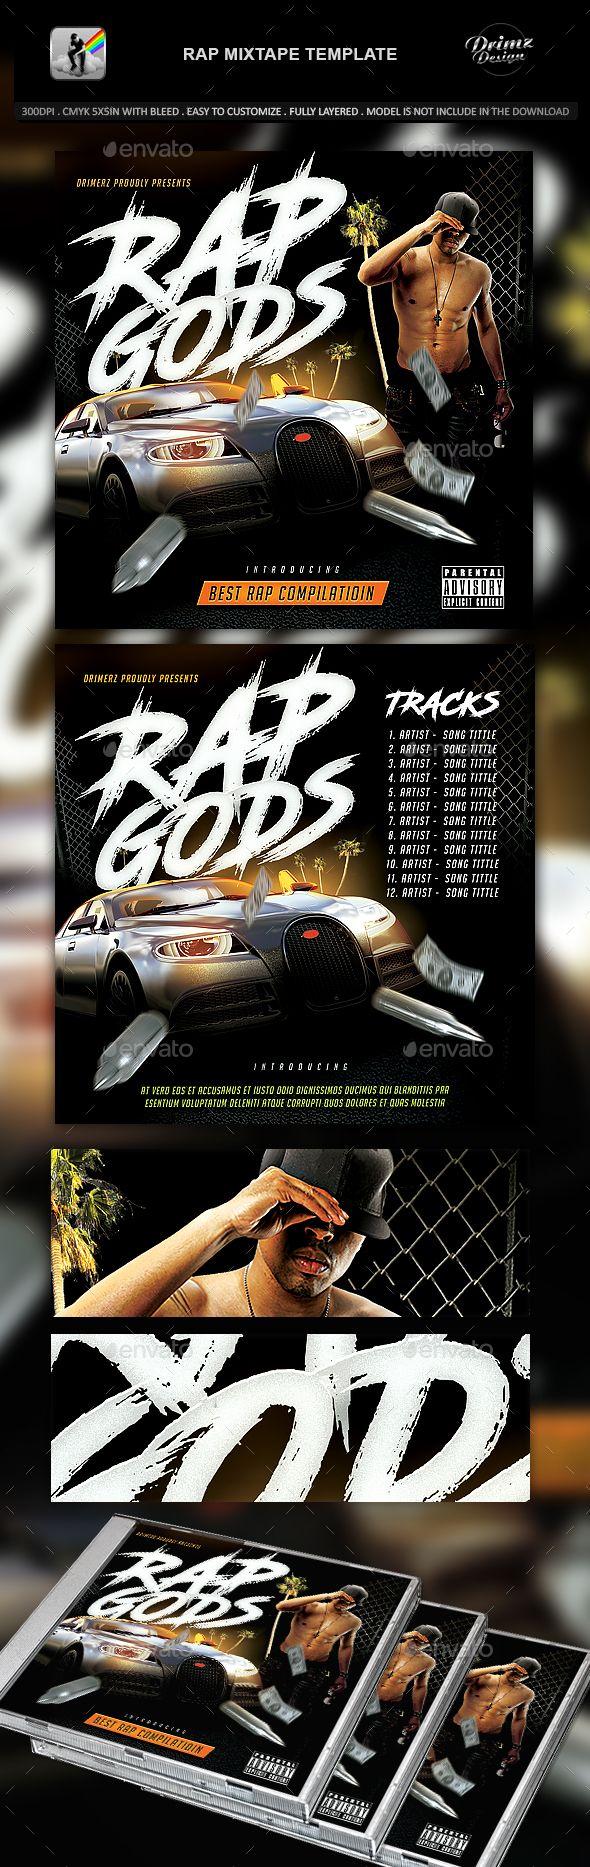 Rap Mixtape Template - #CD & DVD Artwork Print Templates Download here:  https://graphicriver.net/item/rap-mixtape-template/20181710?ref=alena994